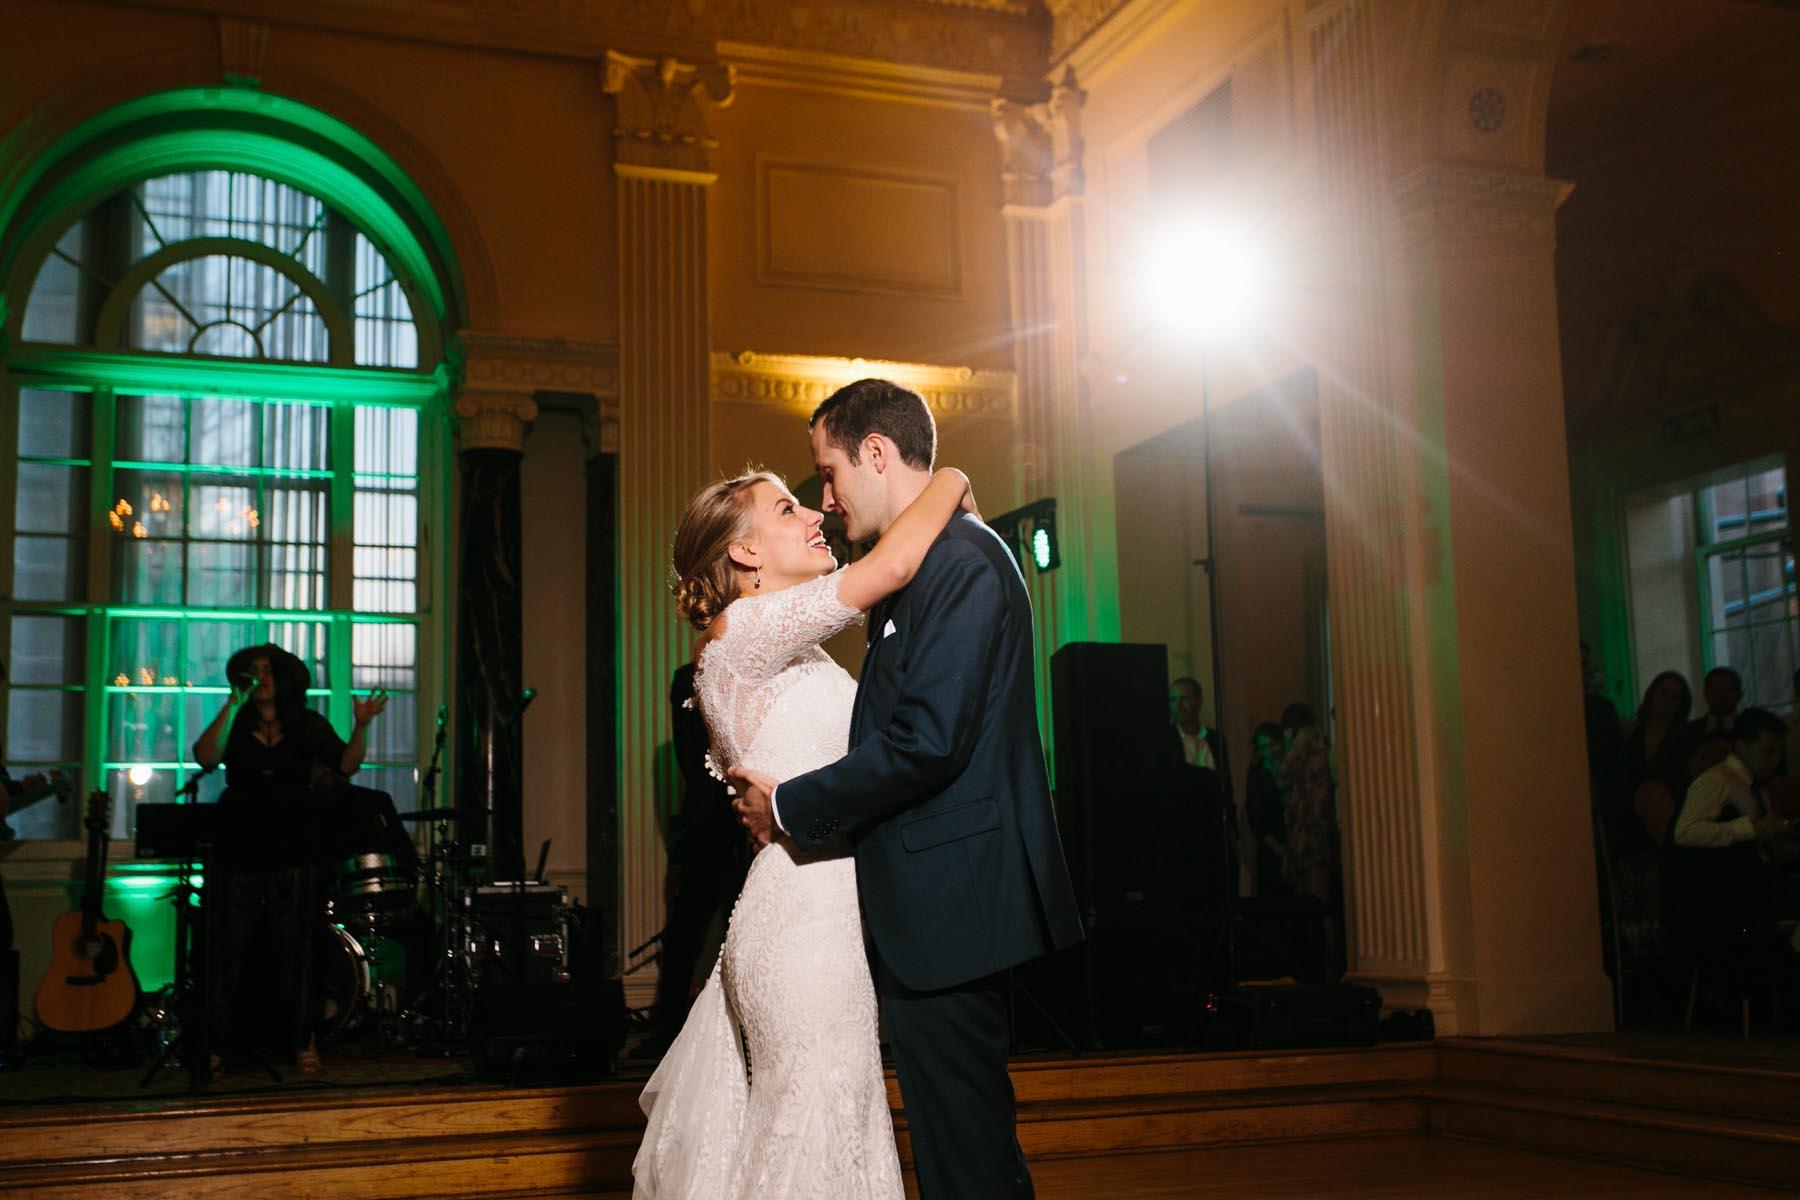 kjellman wedding blog biltmore wedding -96